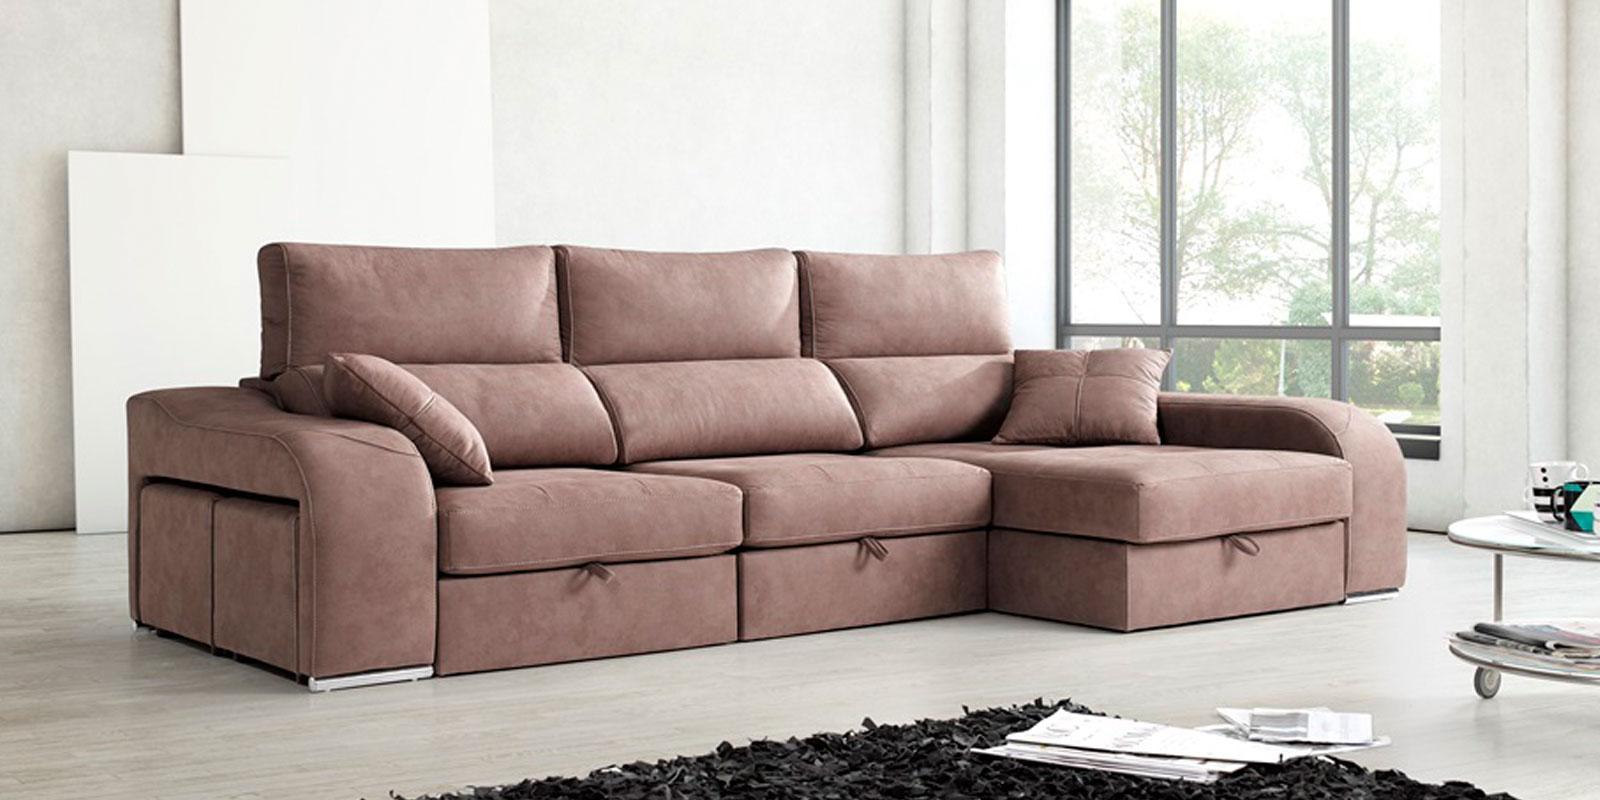 y sofa wamsutta 400 thread count bed sheet set lyon sofas alicante todo